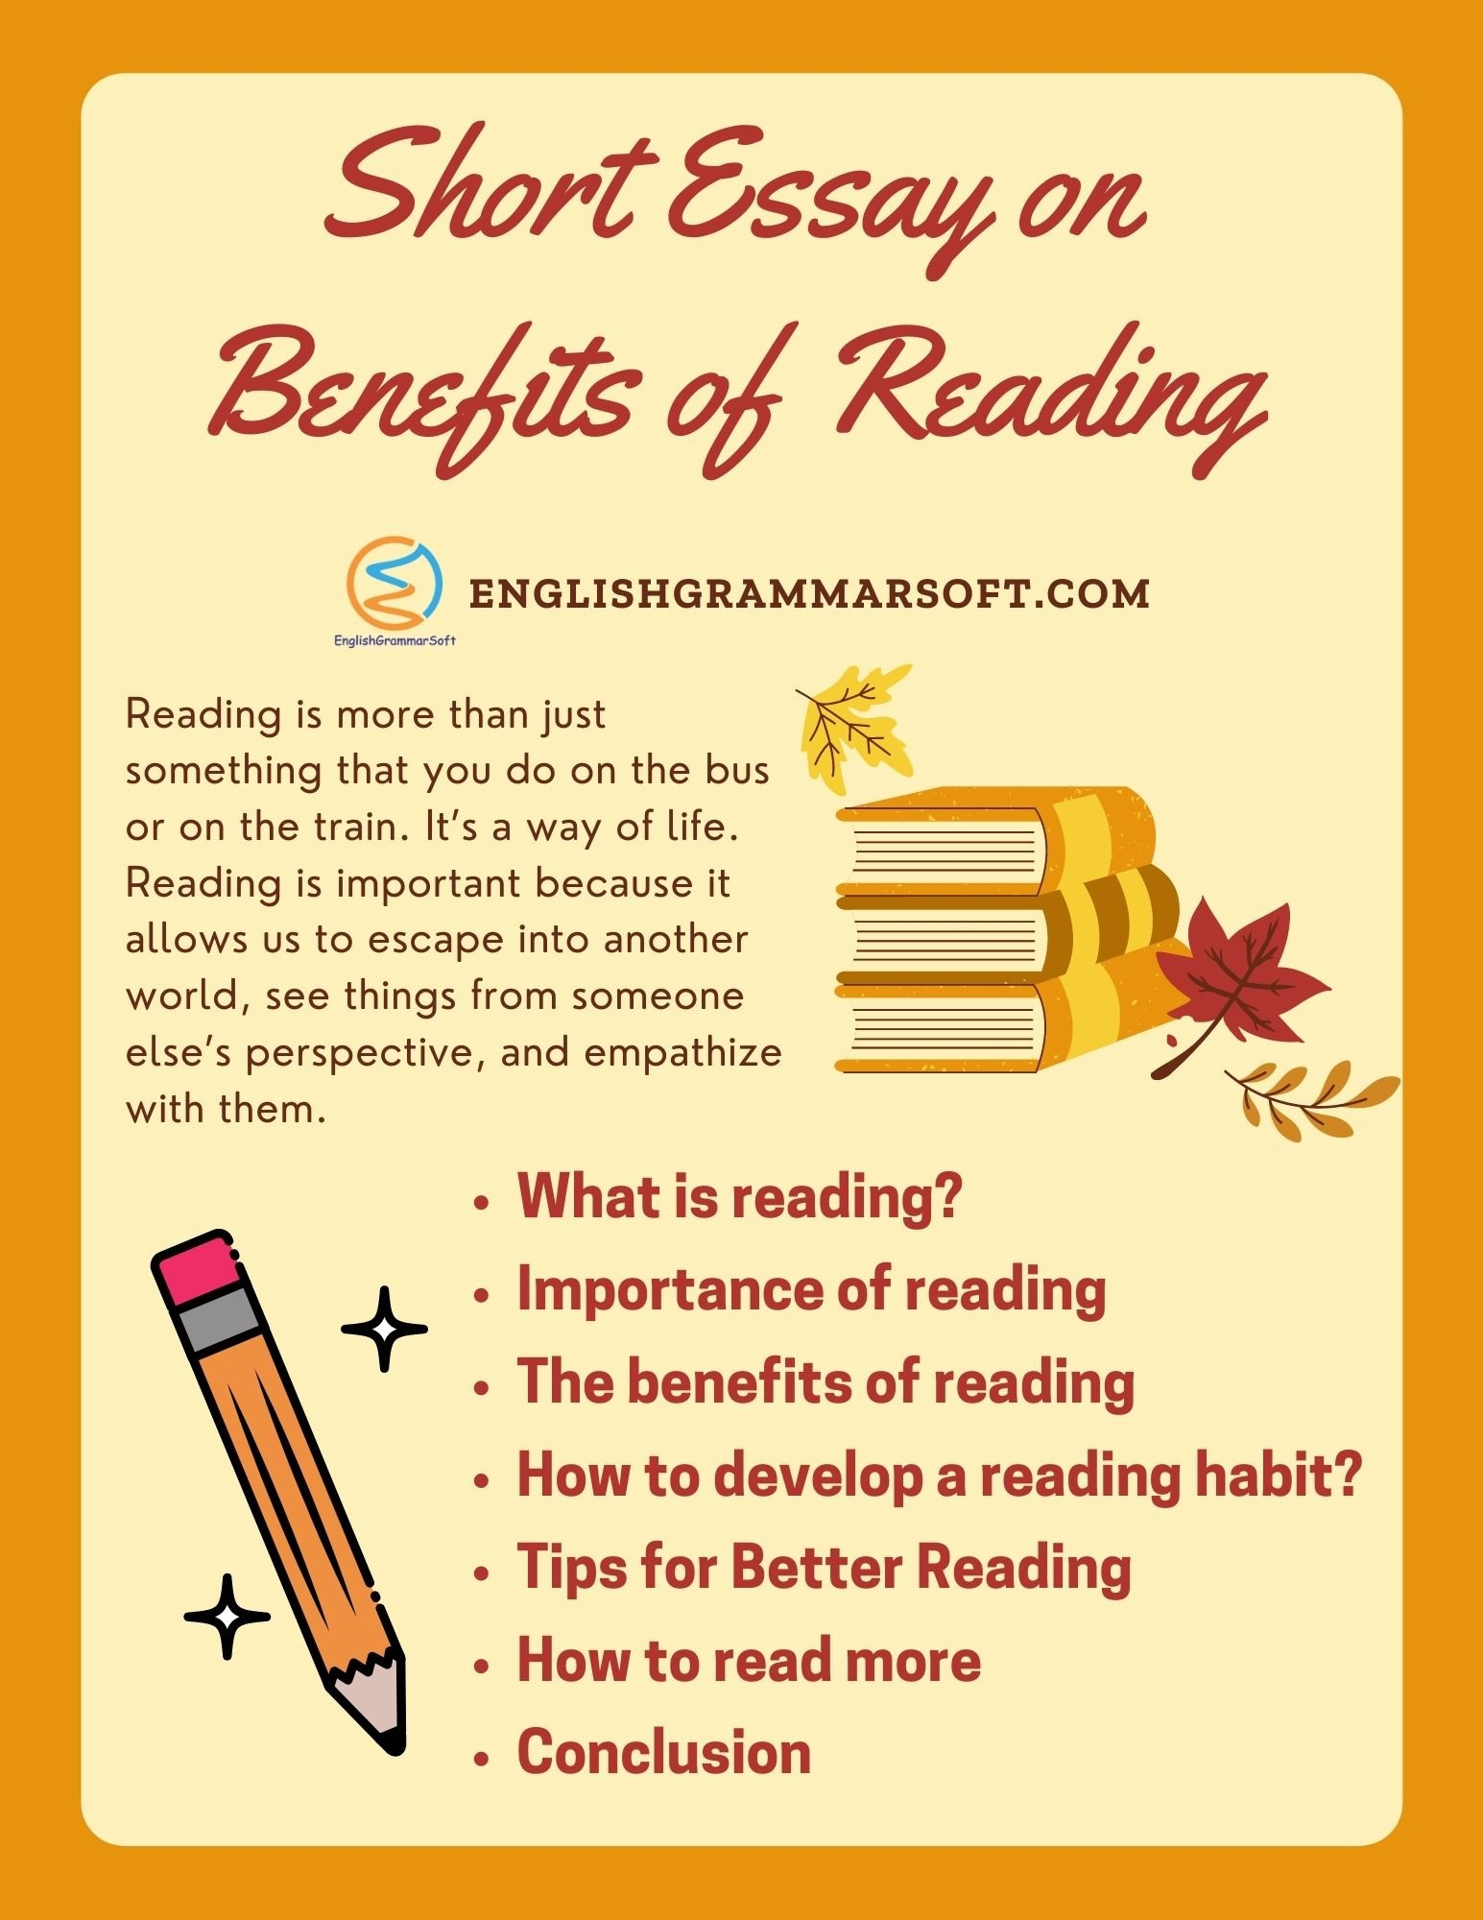 Short Essay on Benefits of Reading